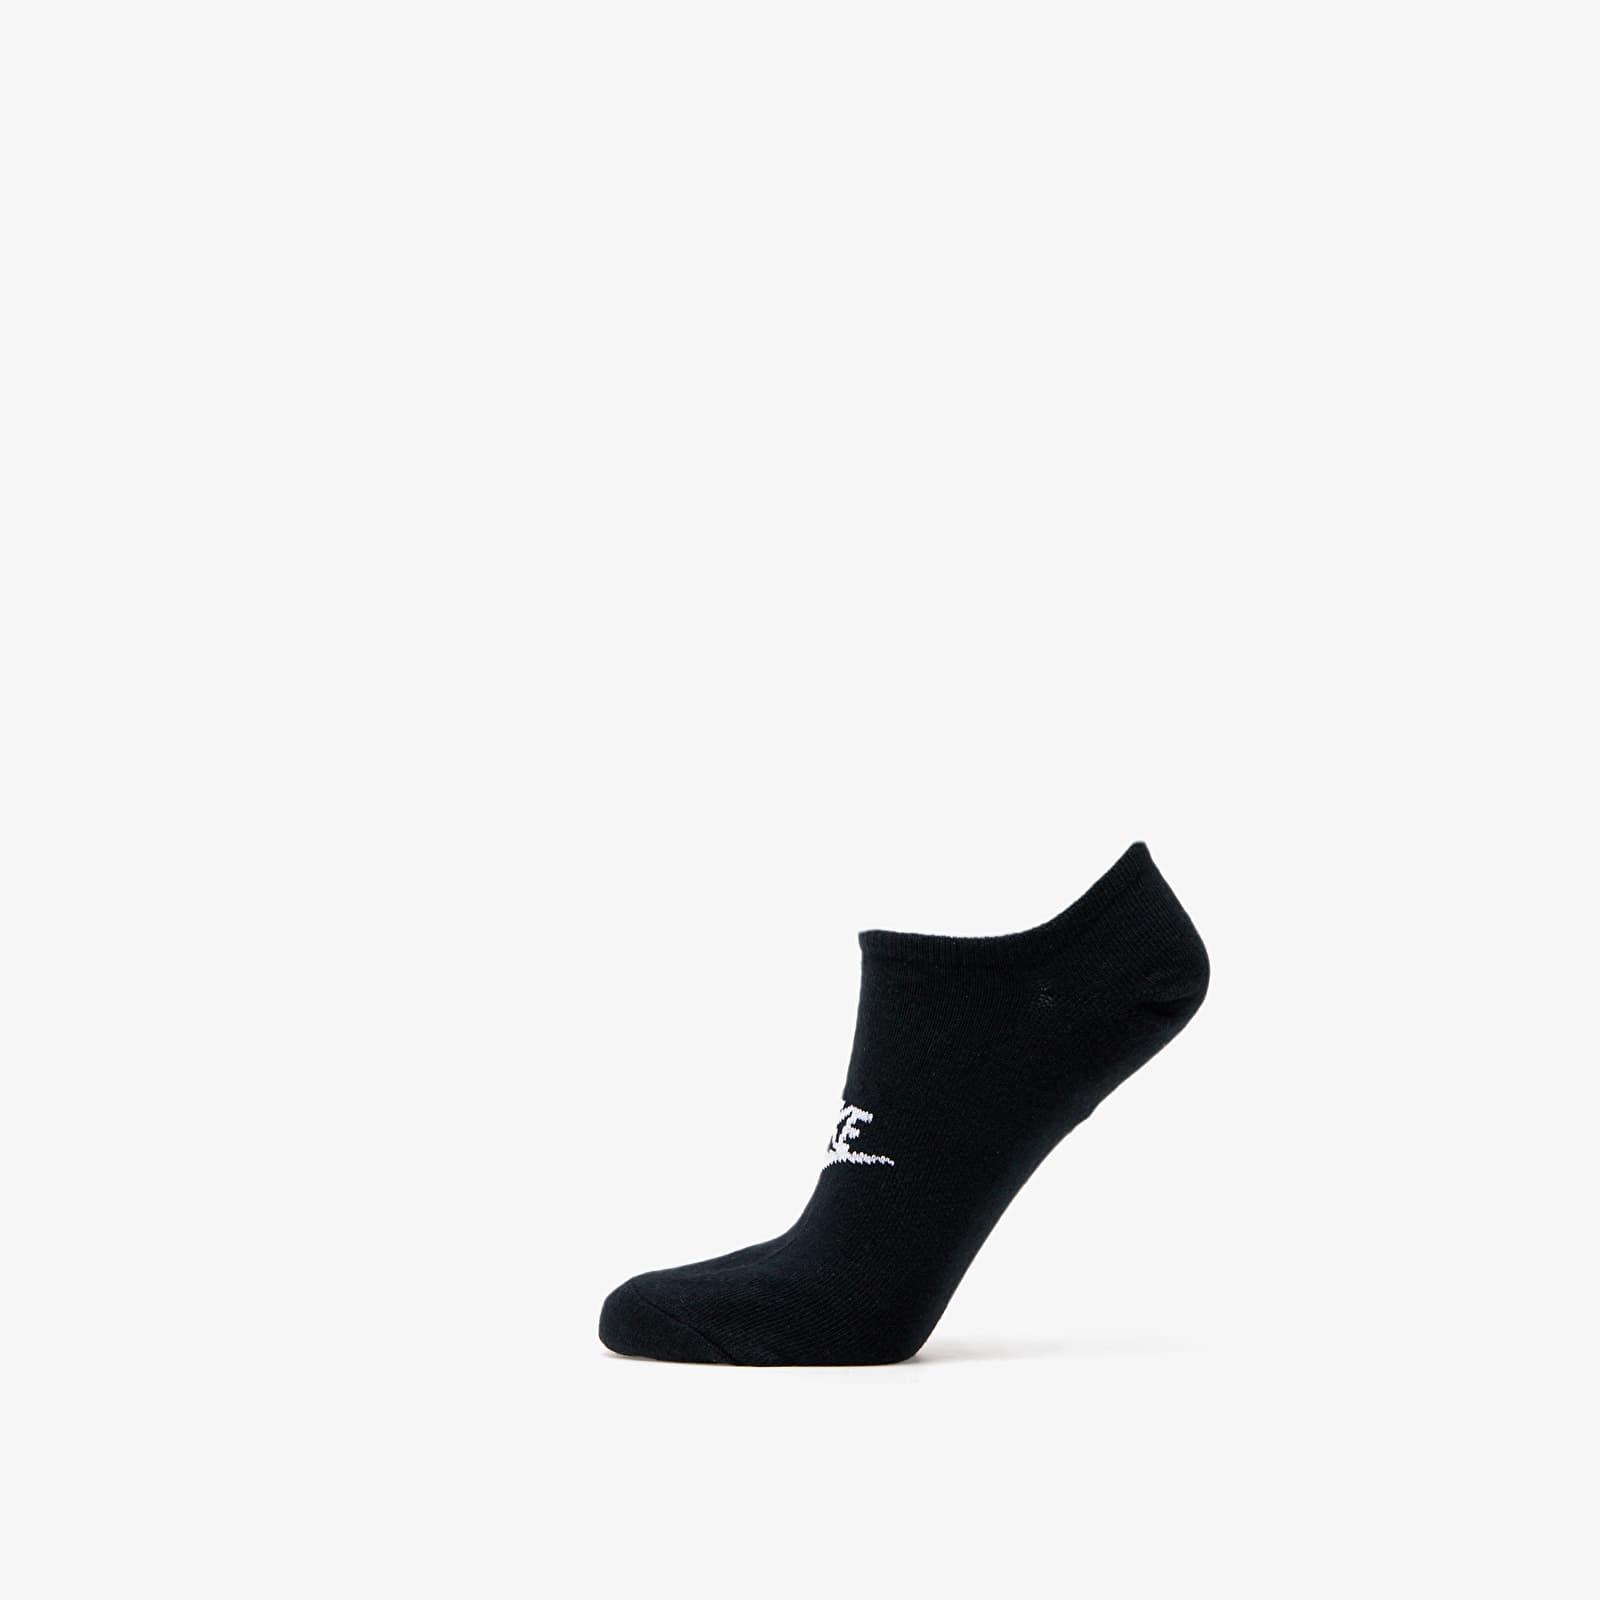 Nike Sportswear Everyday Essential No Show Socks (3-Pack) Black/ White S